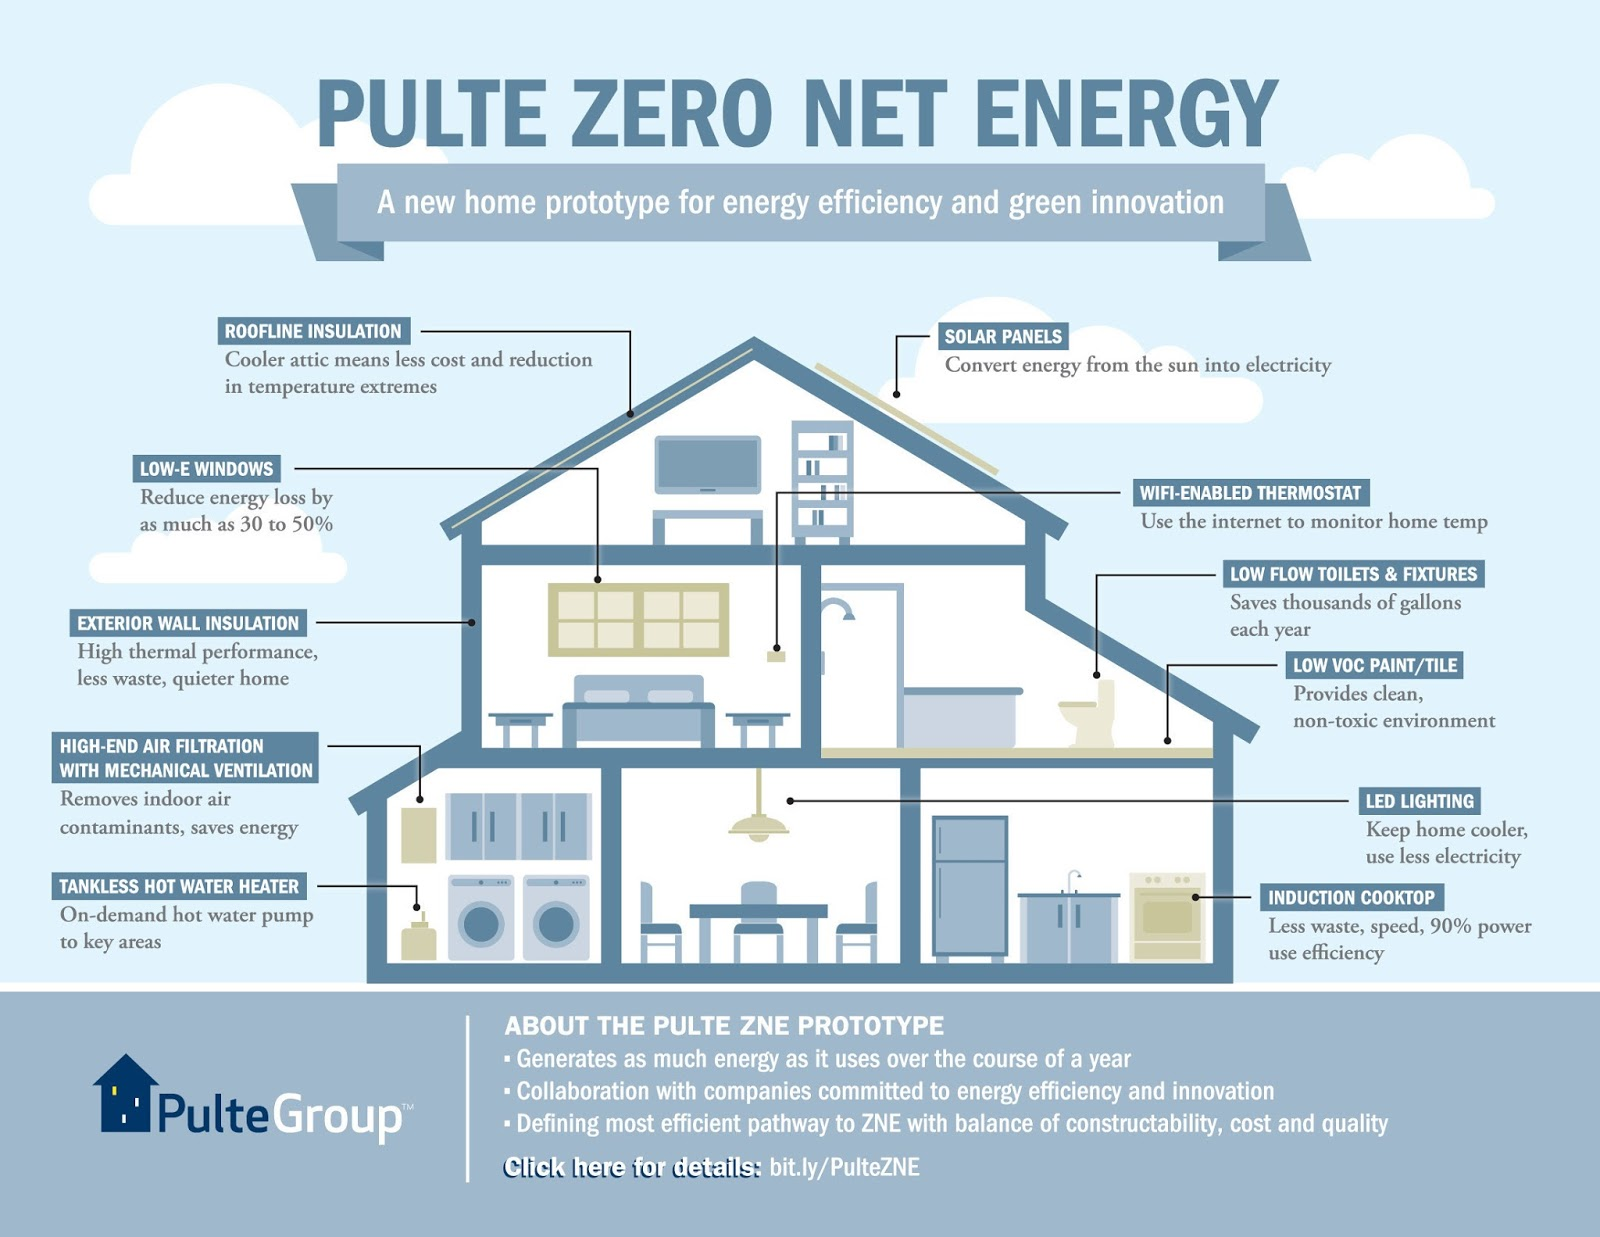 Pultegroup Prototyping Innovative Zero Net Energy Home